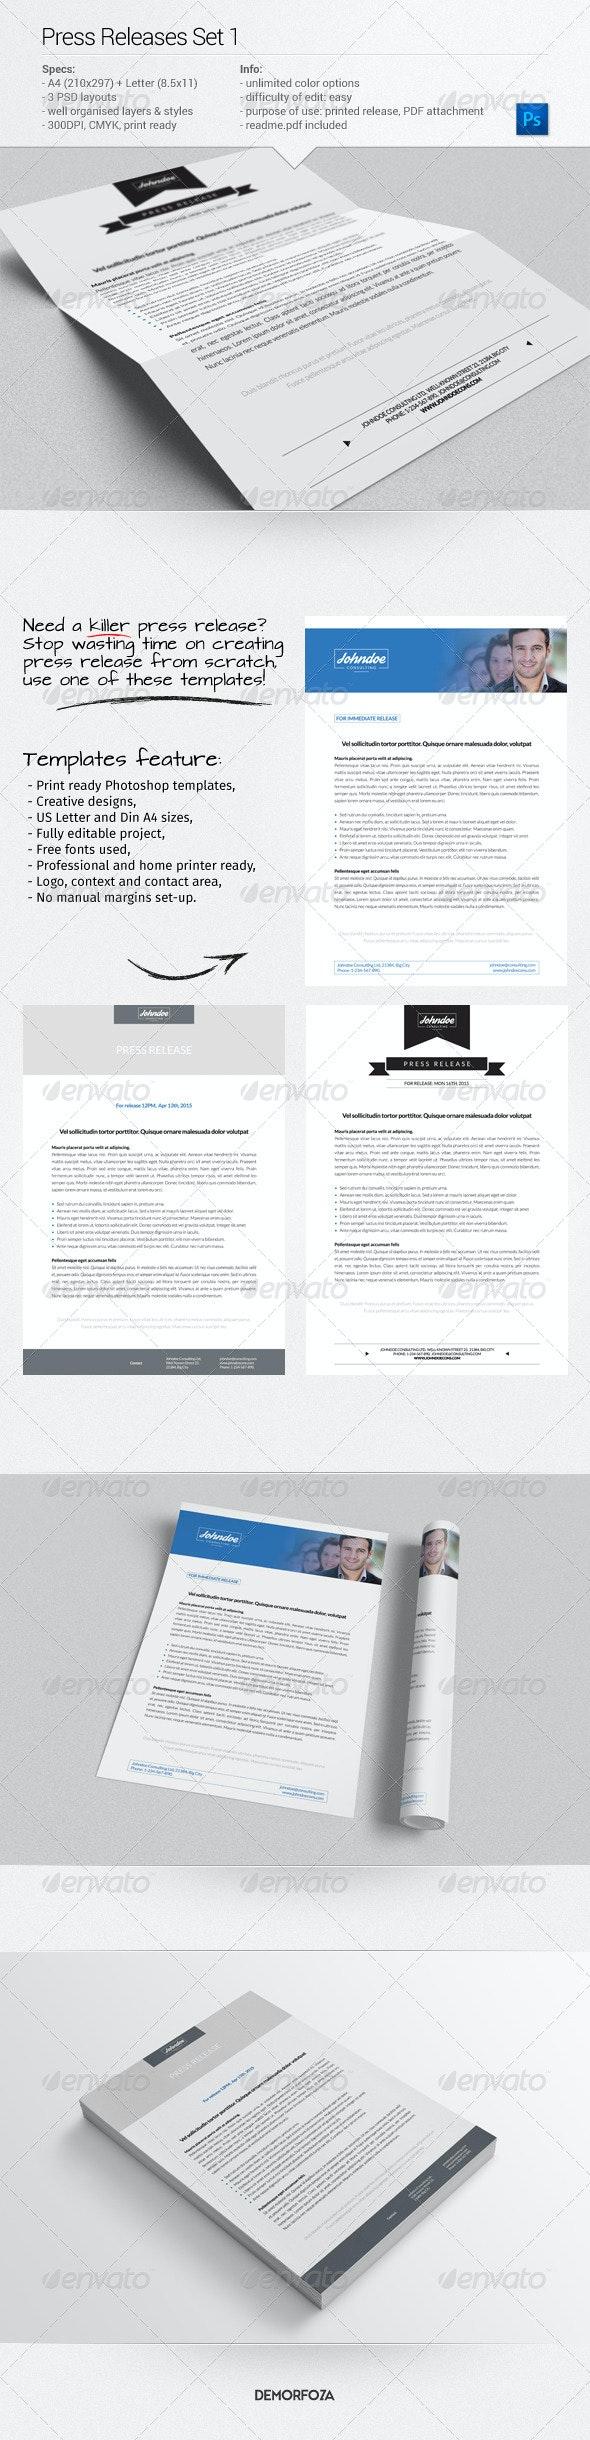 Press Releases Set 1 - Miscellaneous Print Templates